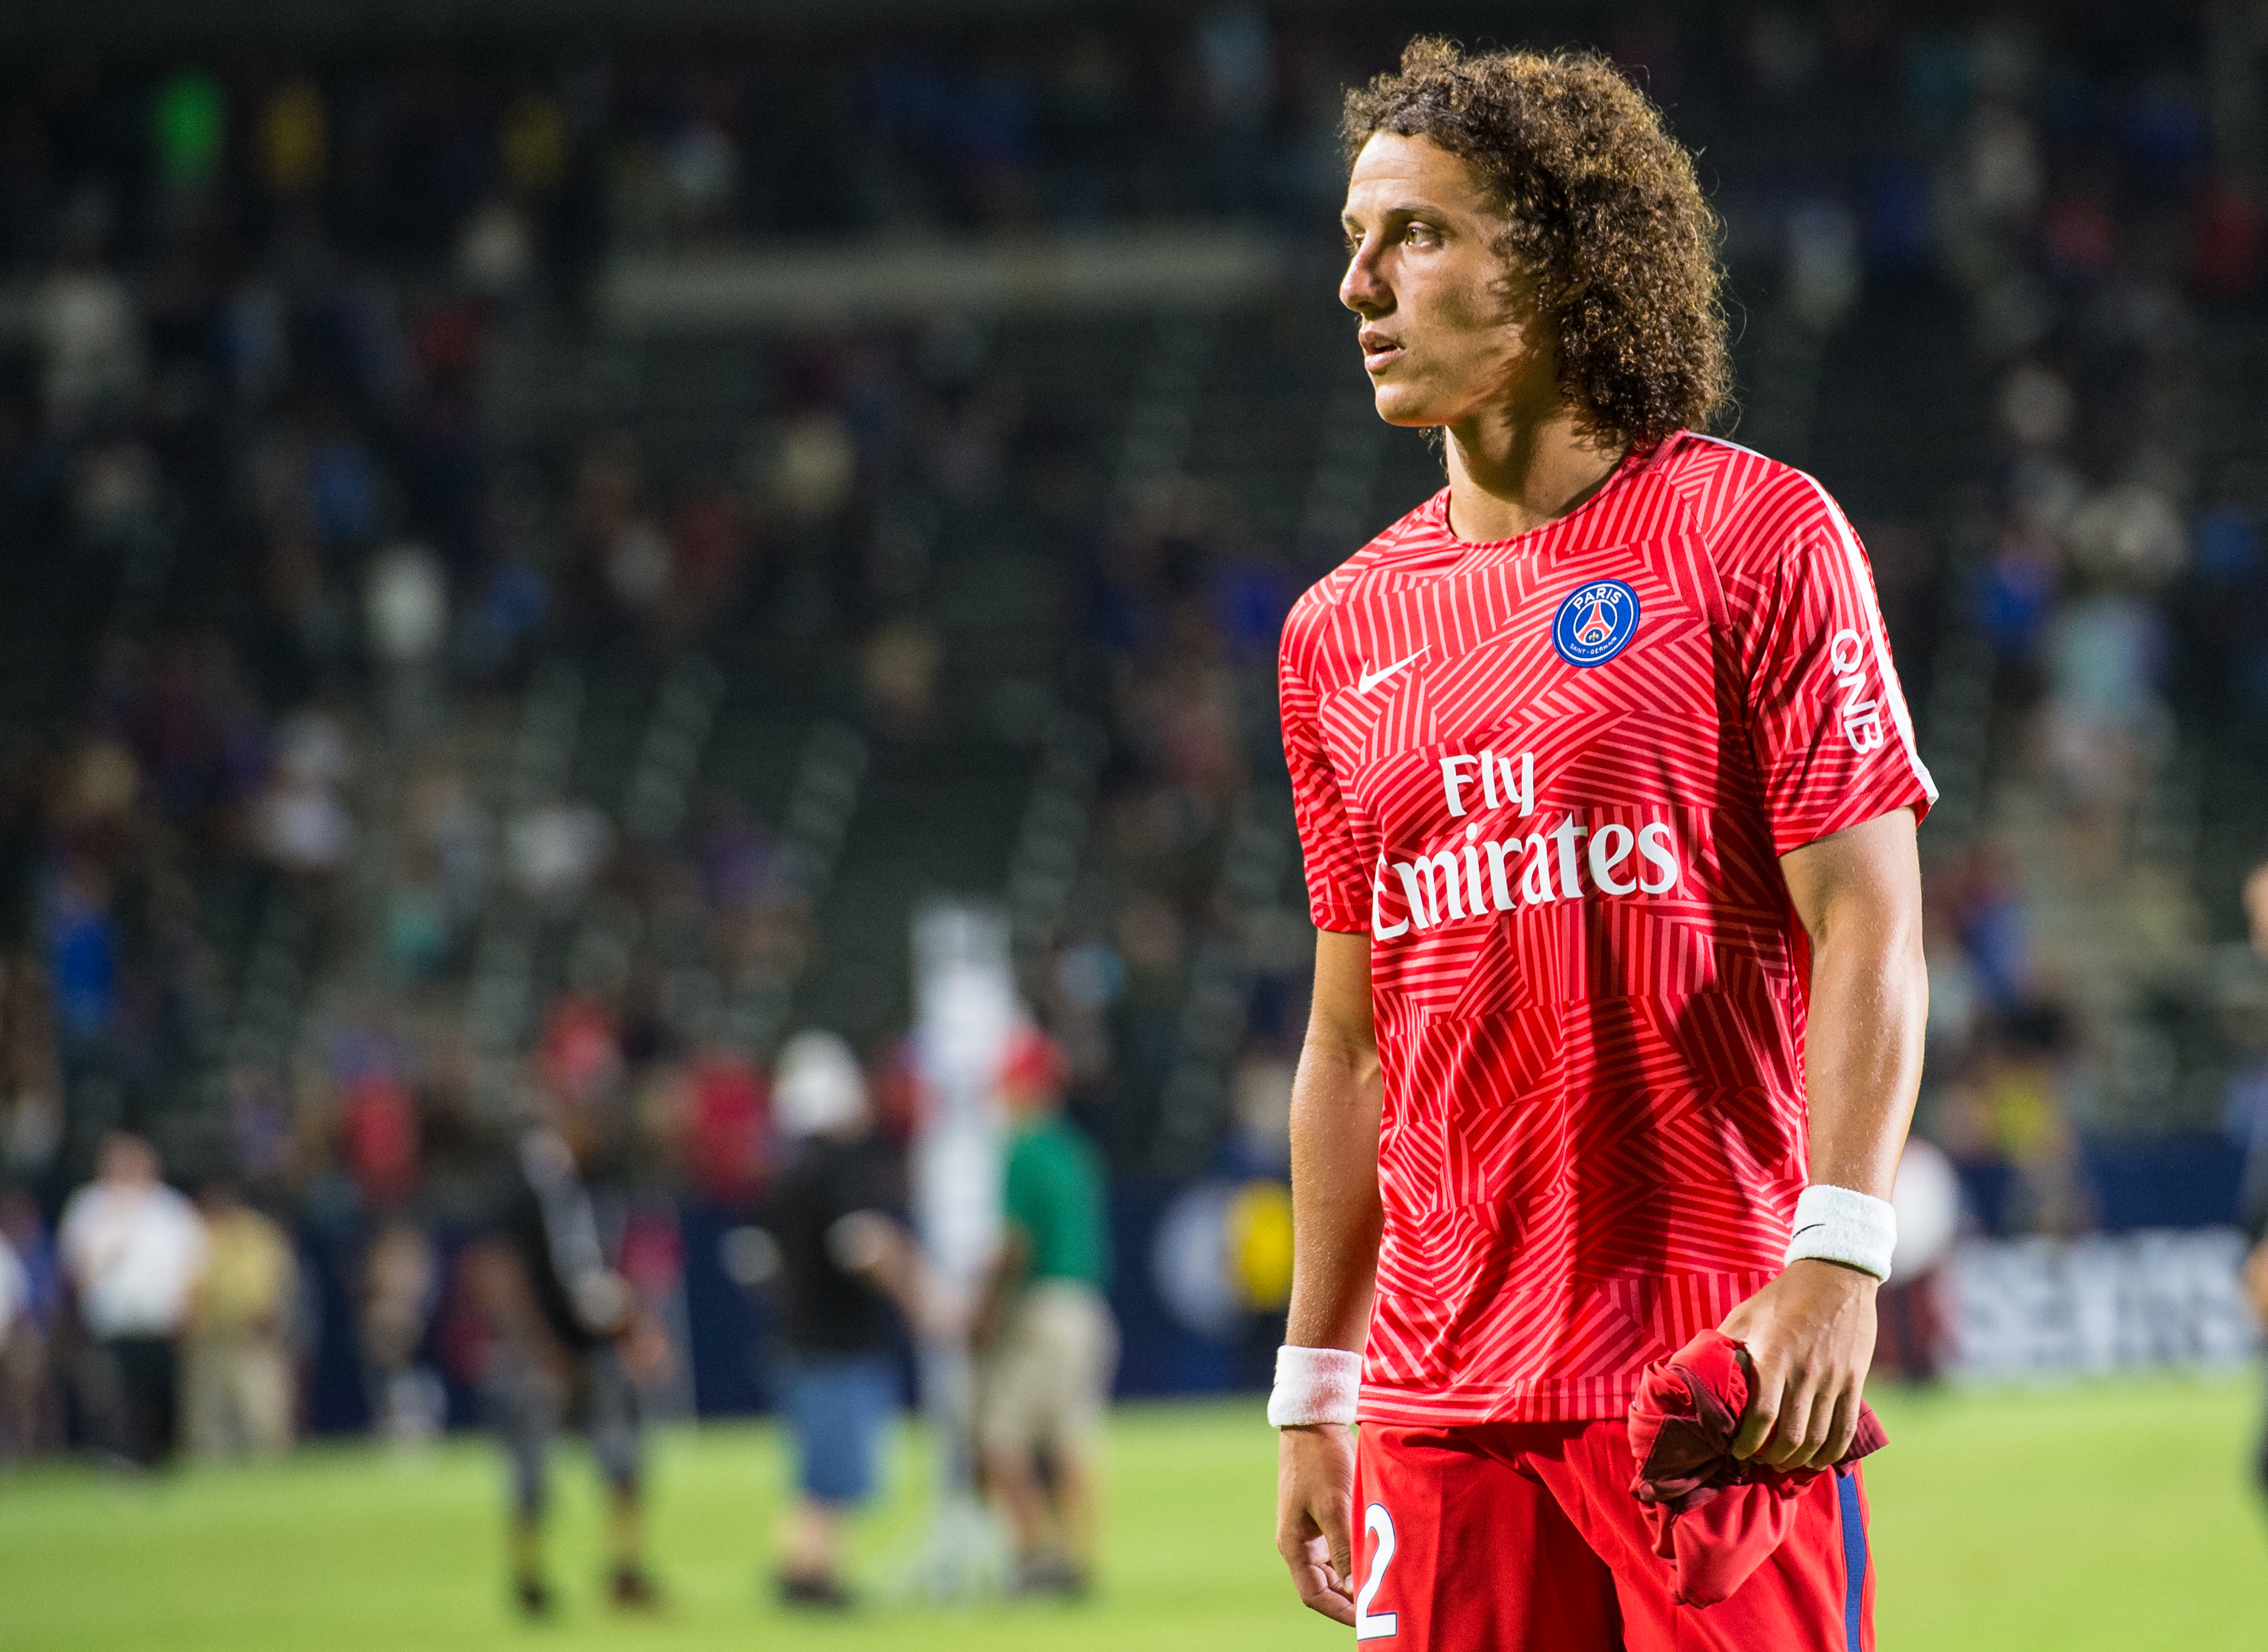 Dispelling some myths surrounding David Luiz